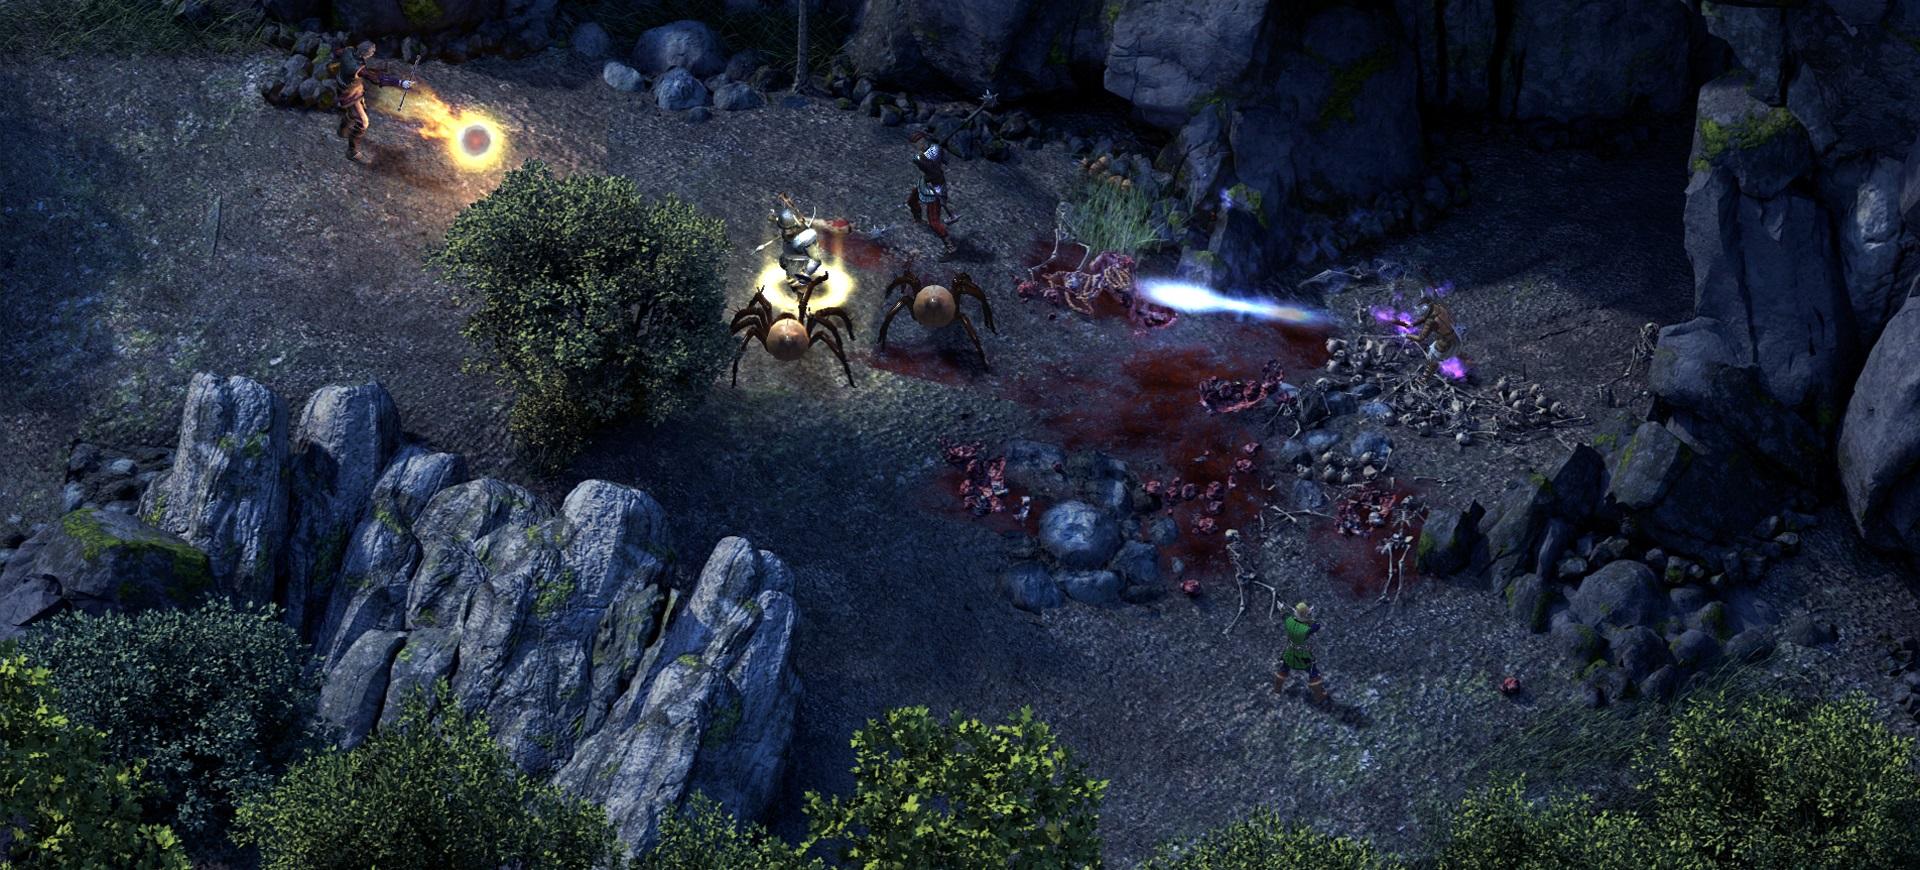 Pillars of Eternity: Definitive Edition anunciado para PC, Mac e Linux